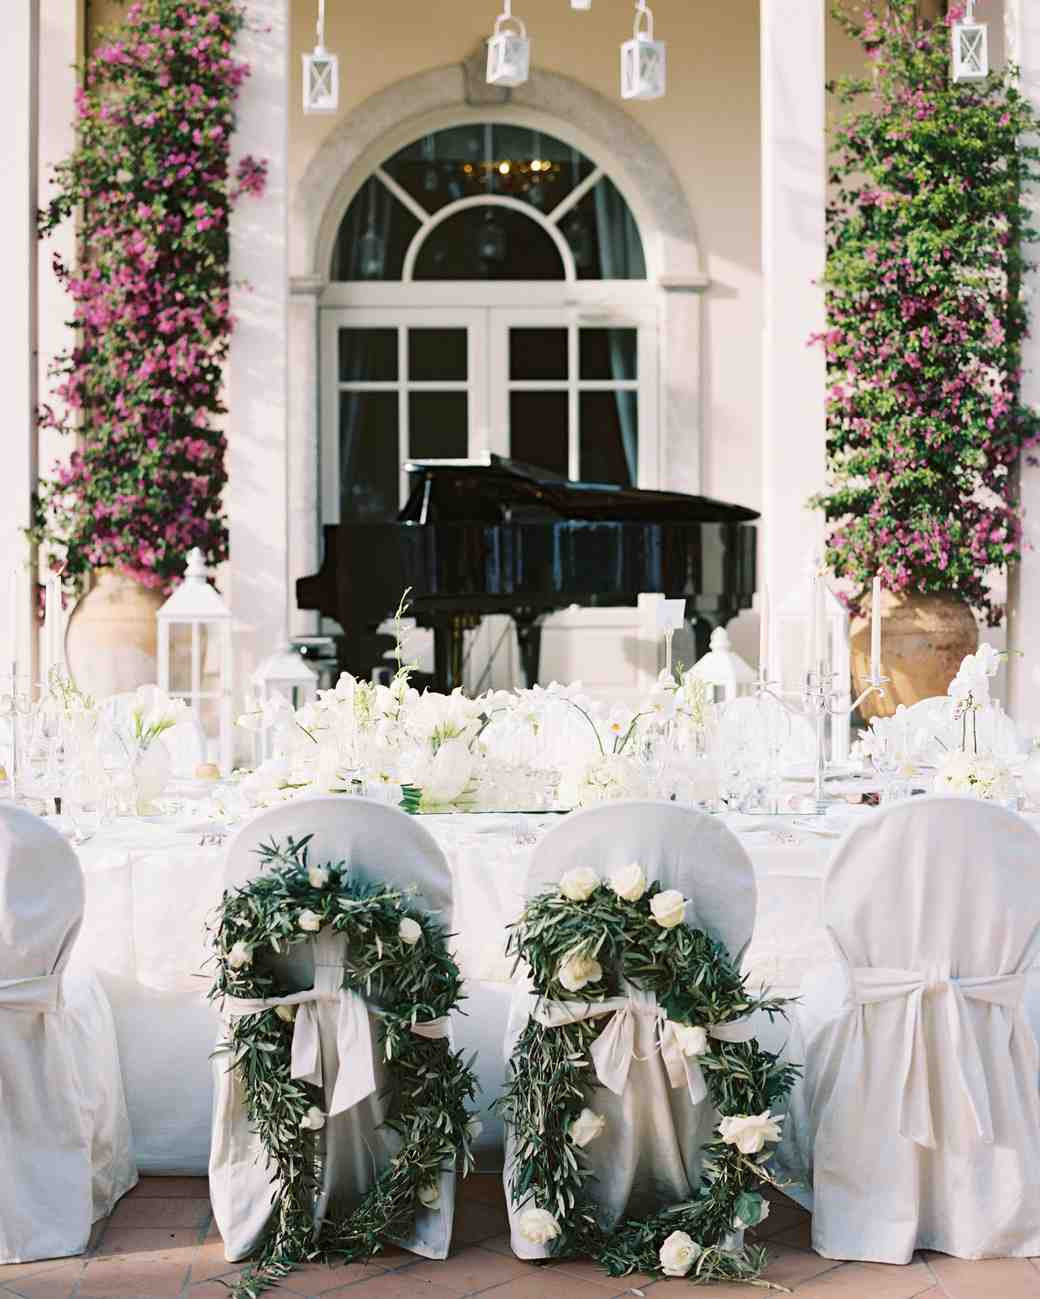 21 Spectacular Sand for Wedding Unity Vase 2021 free download sand for wedding unity vase of 79 white wedding centerpieces martha stewart weddings inside reception chairs